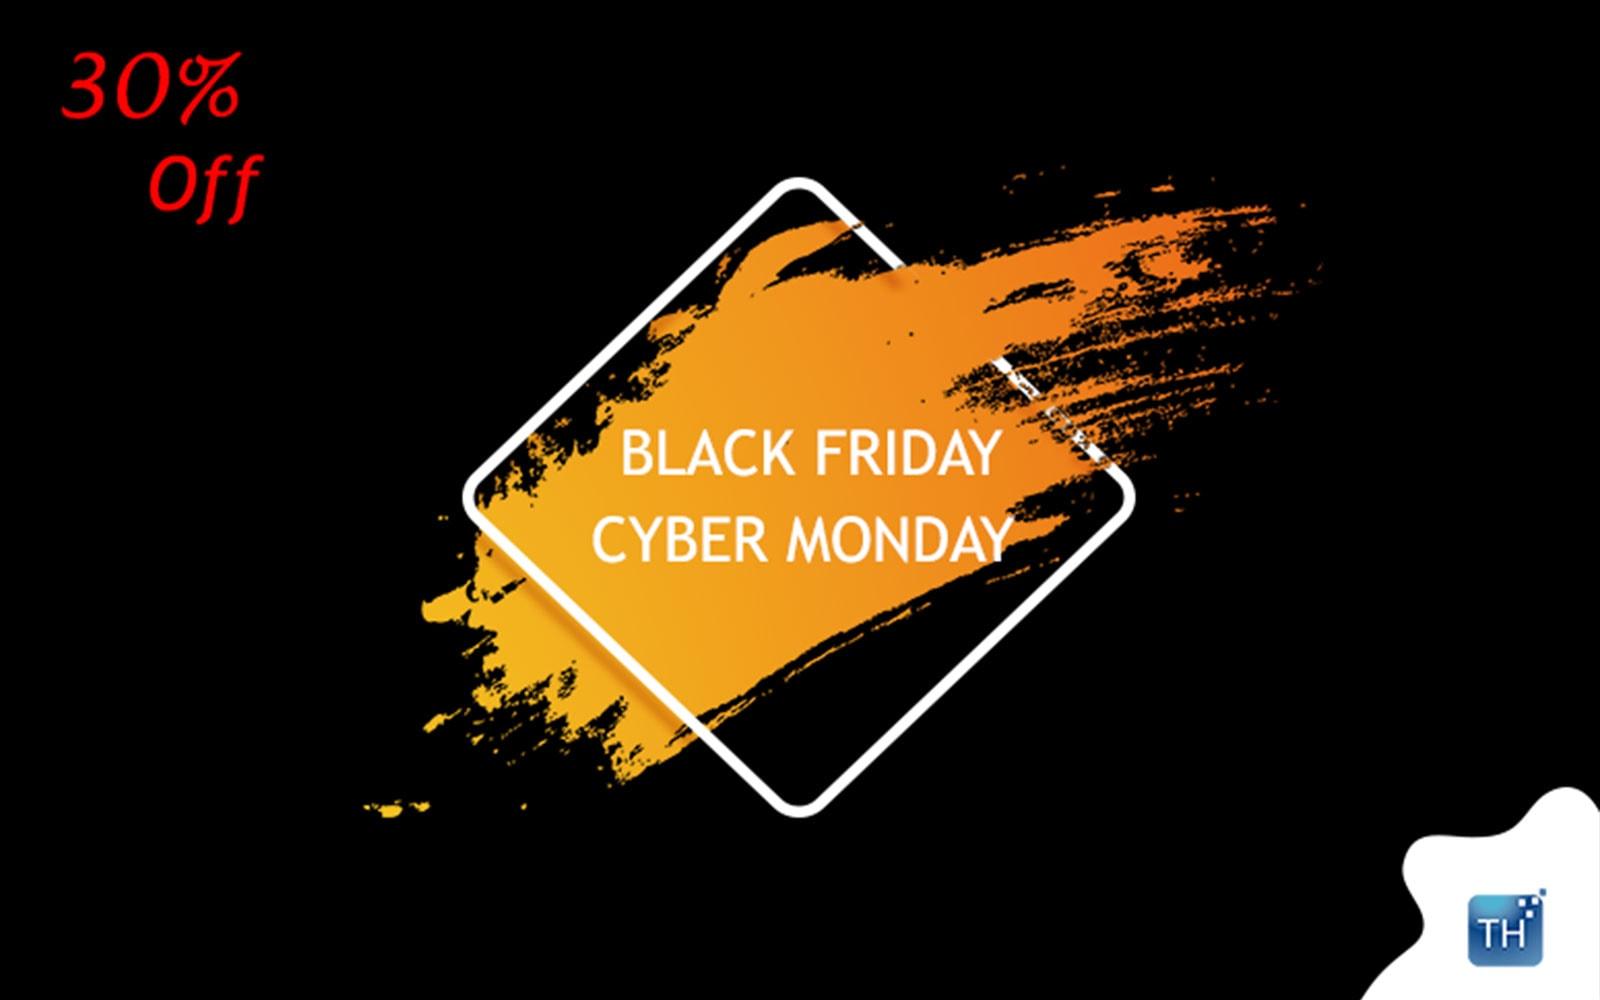 ThemeHunk – 30% Off Discount Code